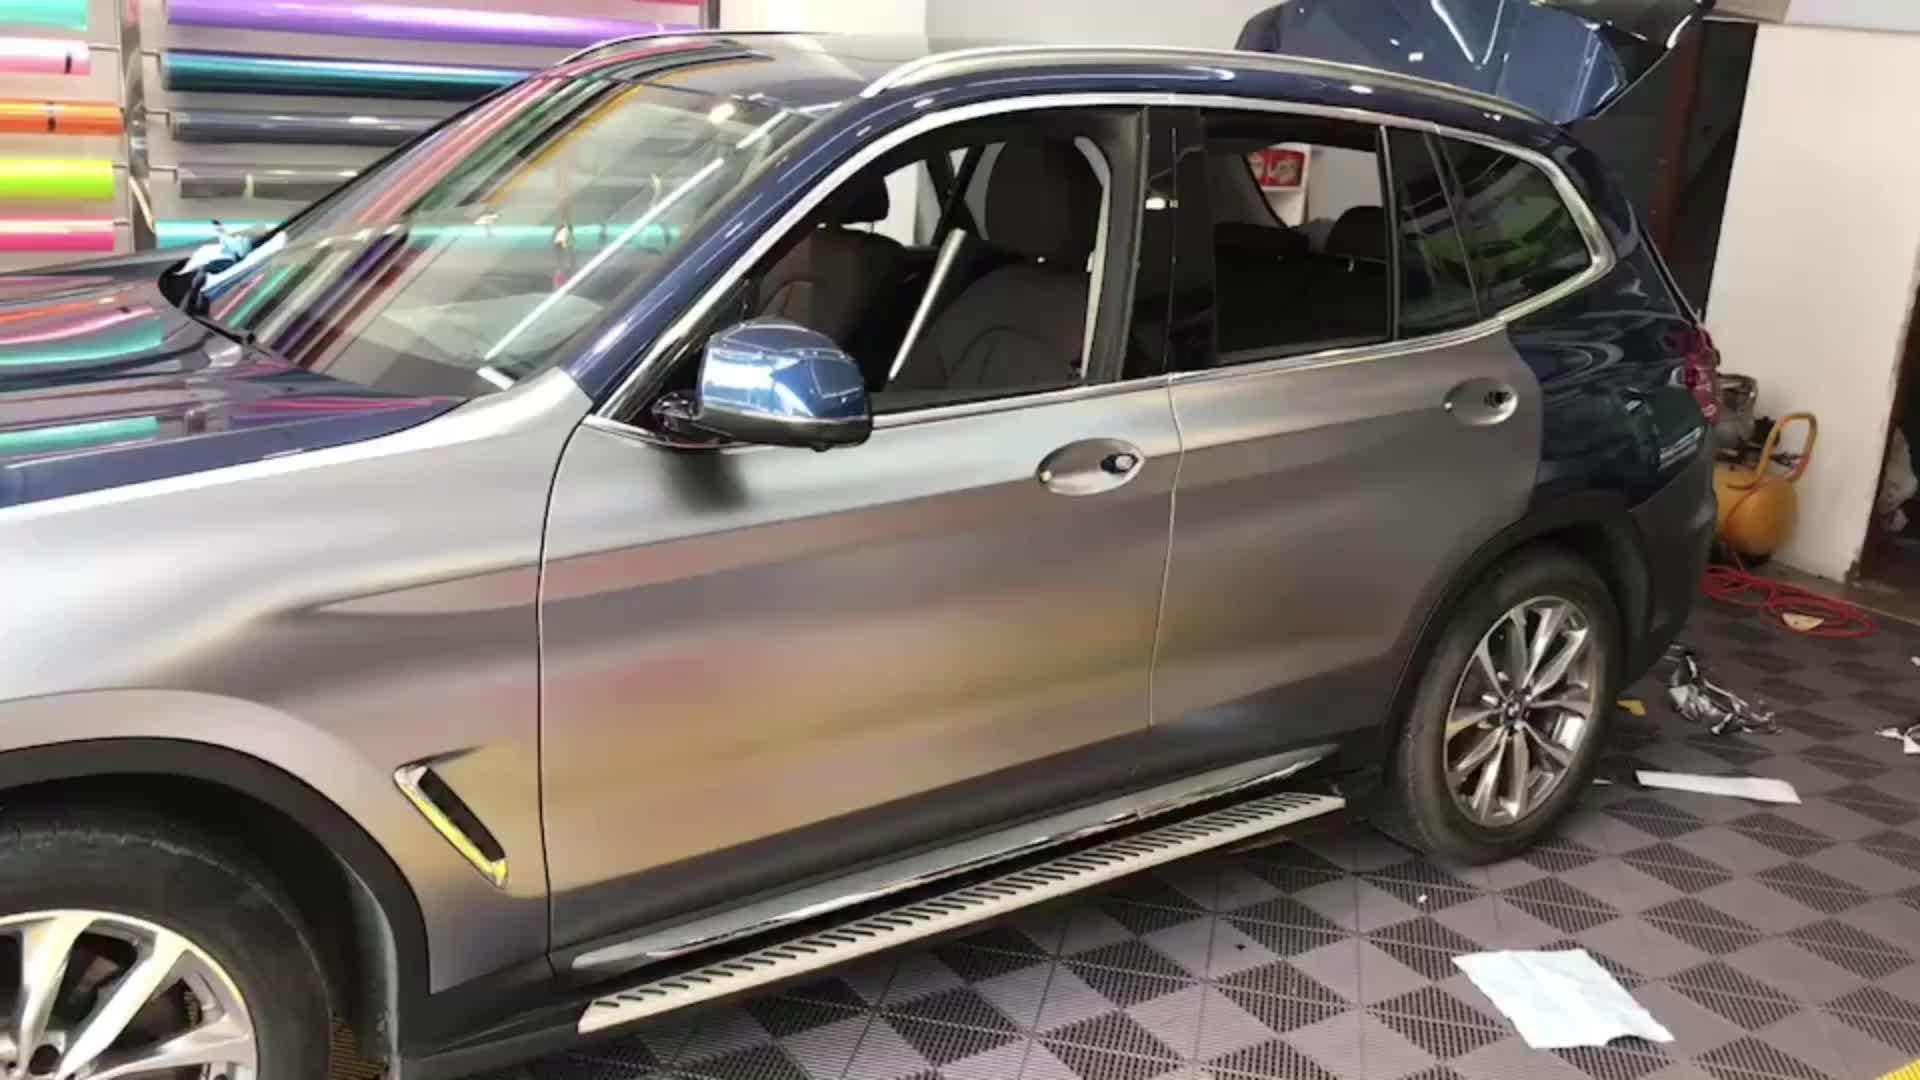 CARLIKE Chrome Car Mirror Prospect แบรนด์ใหม่สติ๊กเกอร์ตัวถังรถ